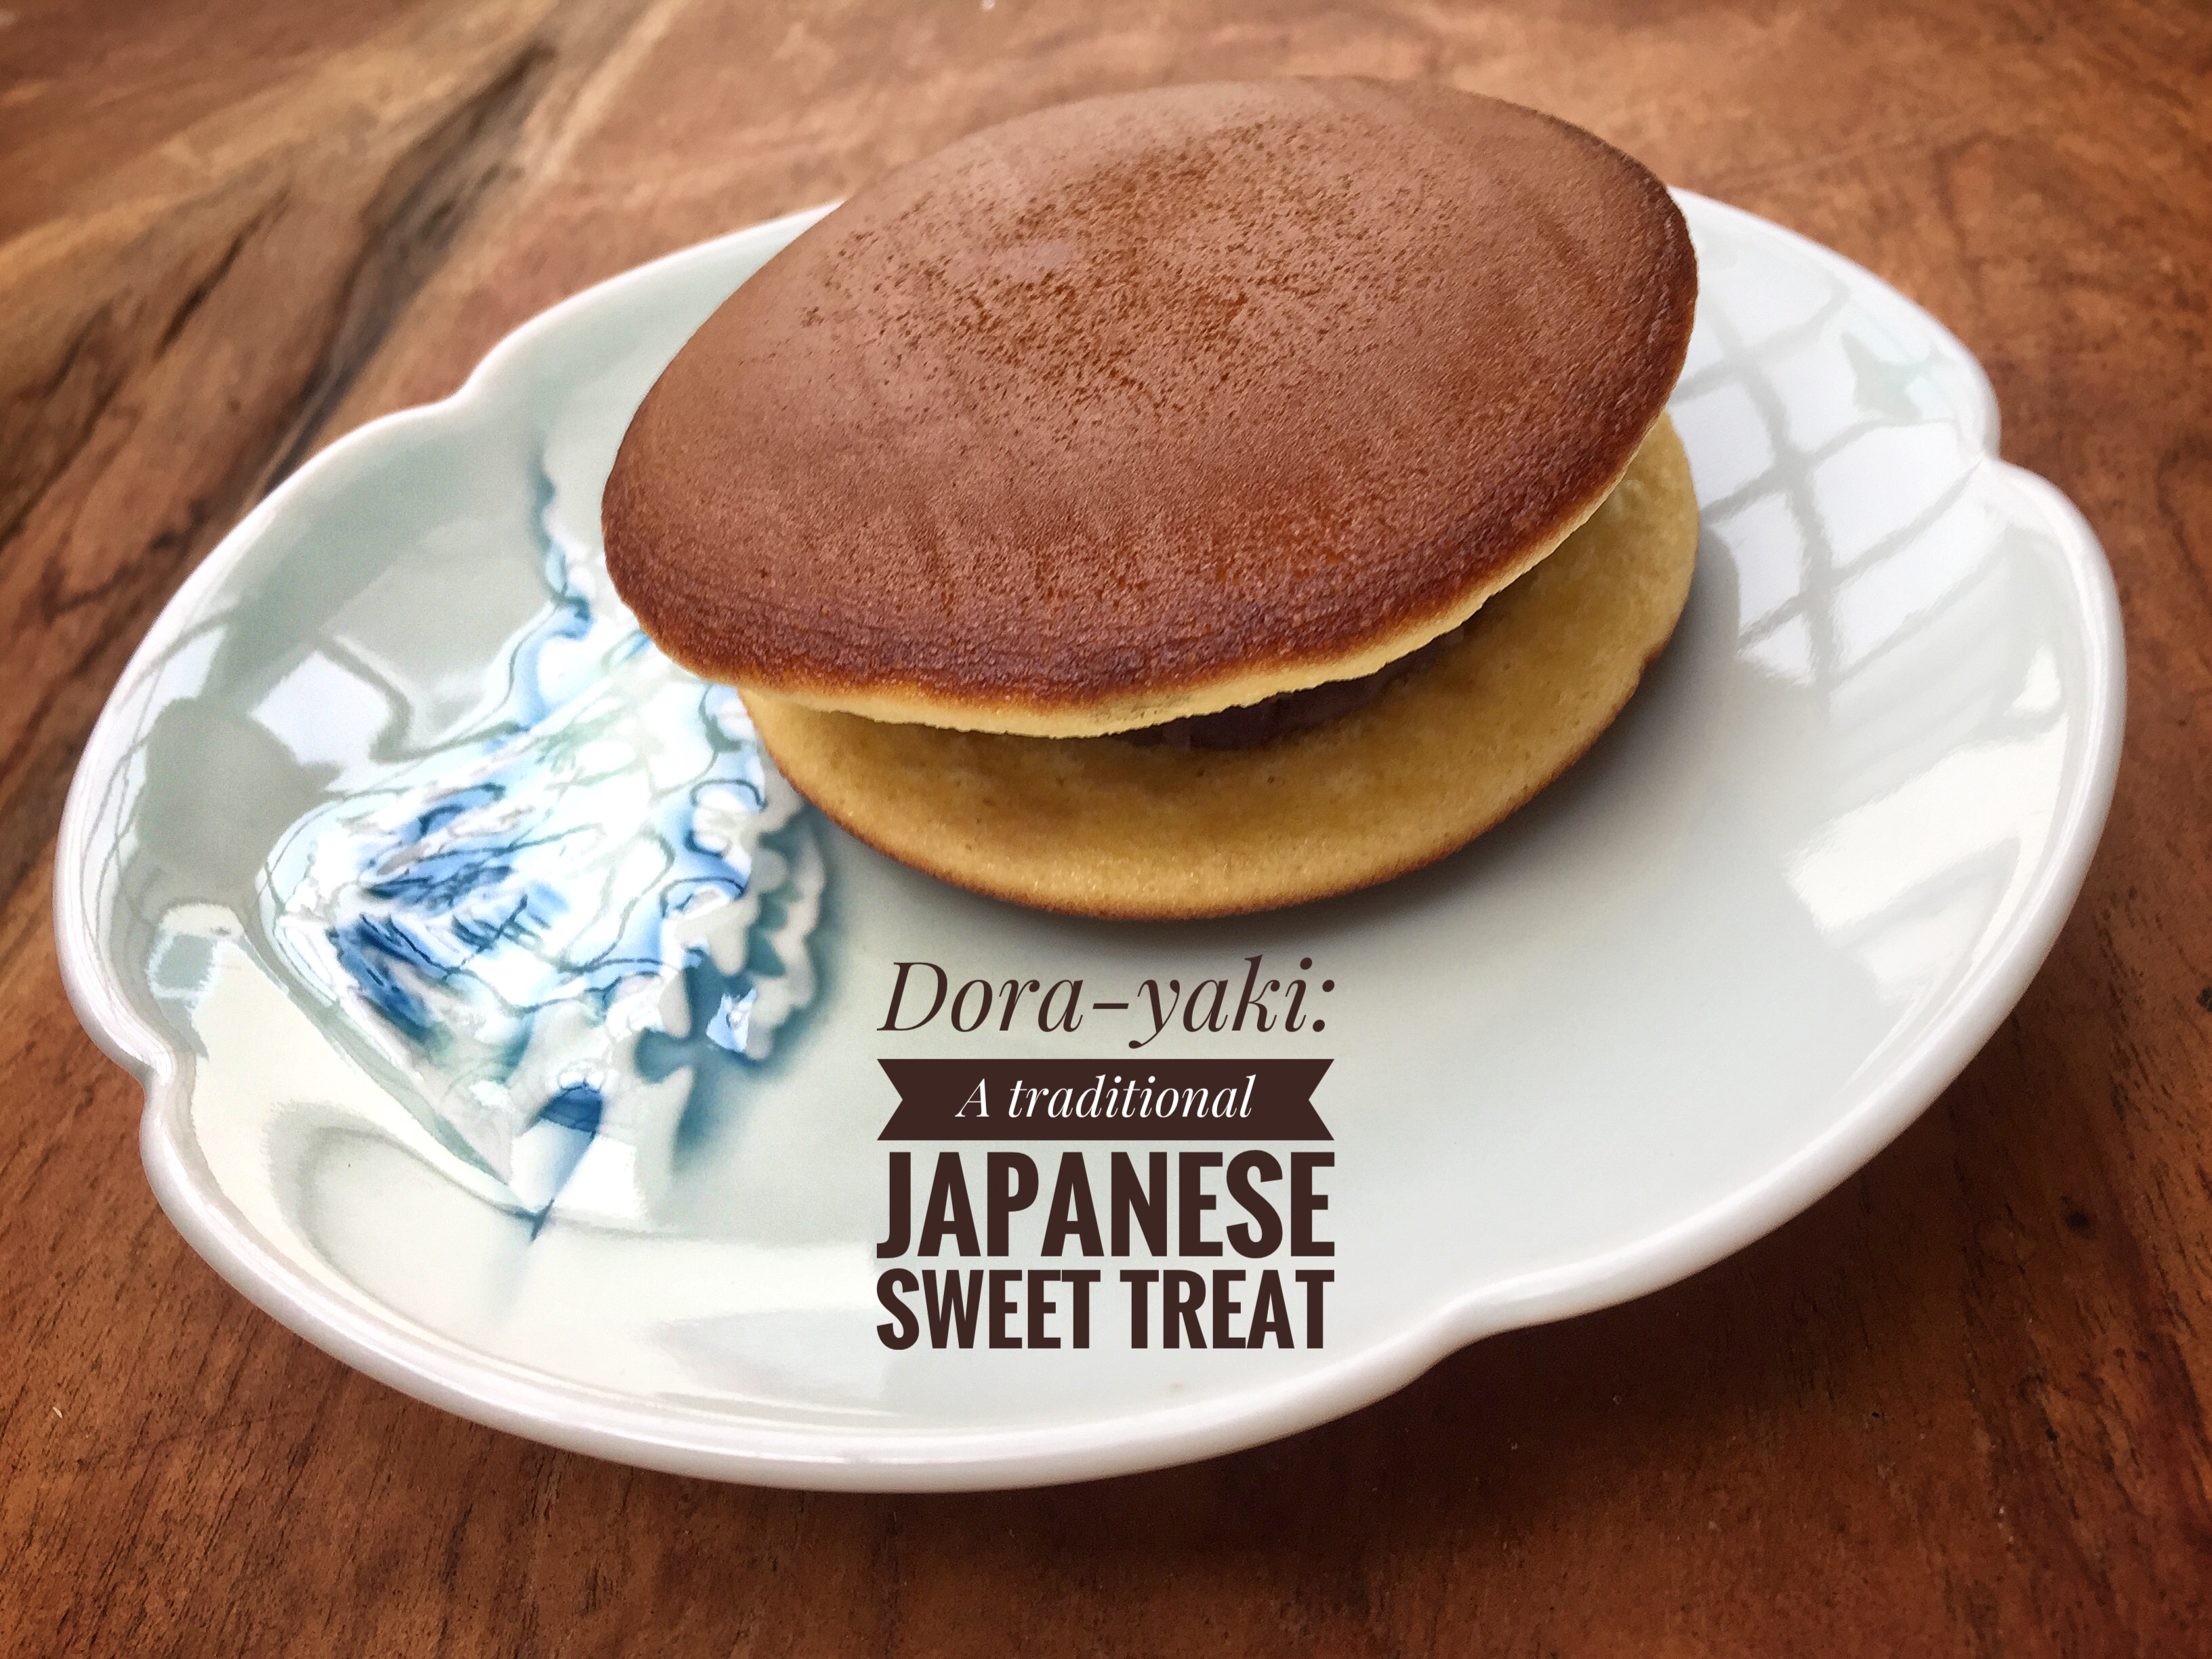 Japanese Dora Cake Recipe: Dora-yummy: Your Intro To Delicious Dora-yaki